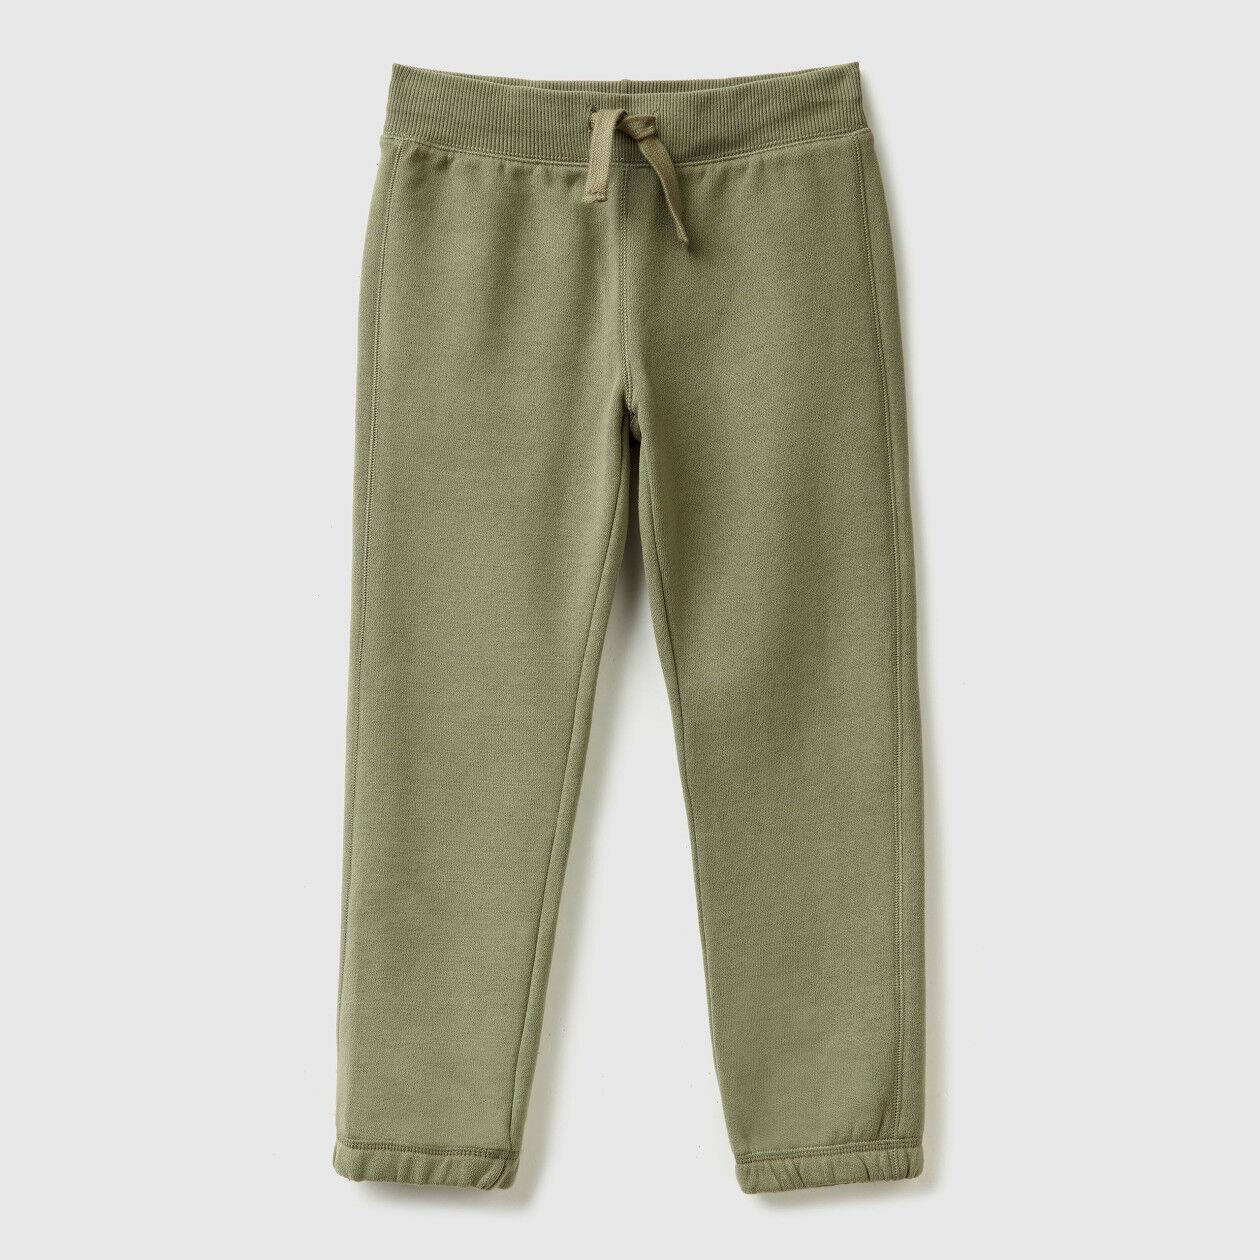 Jogging pants with elastic